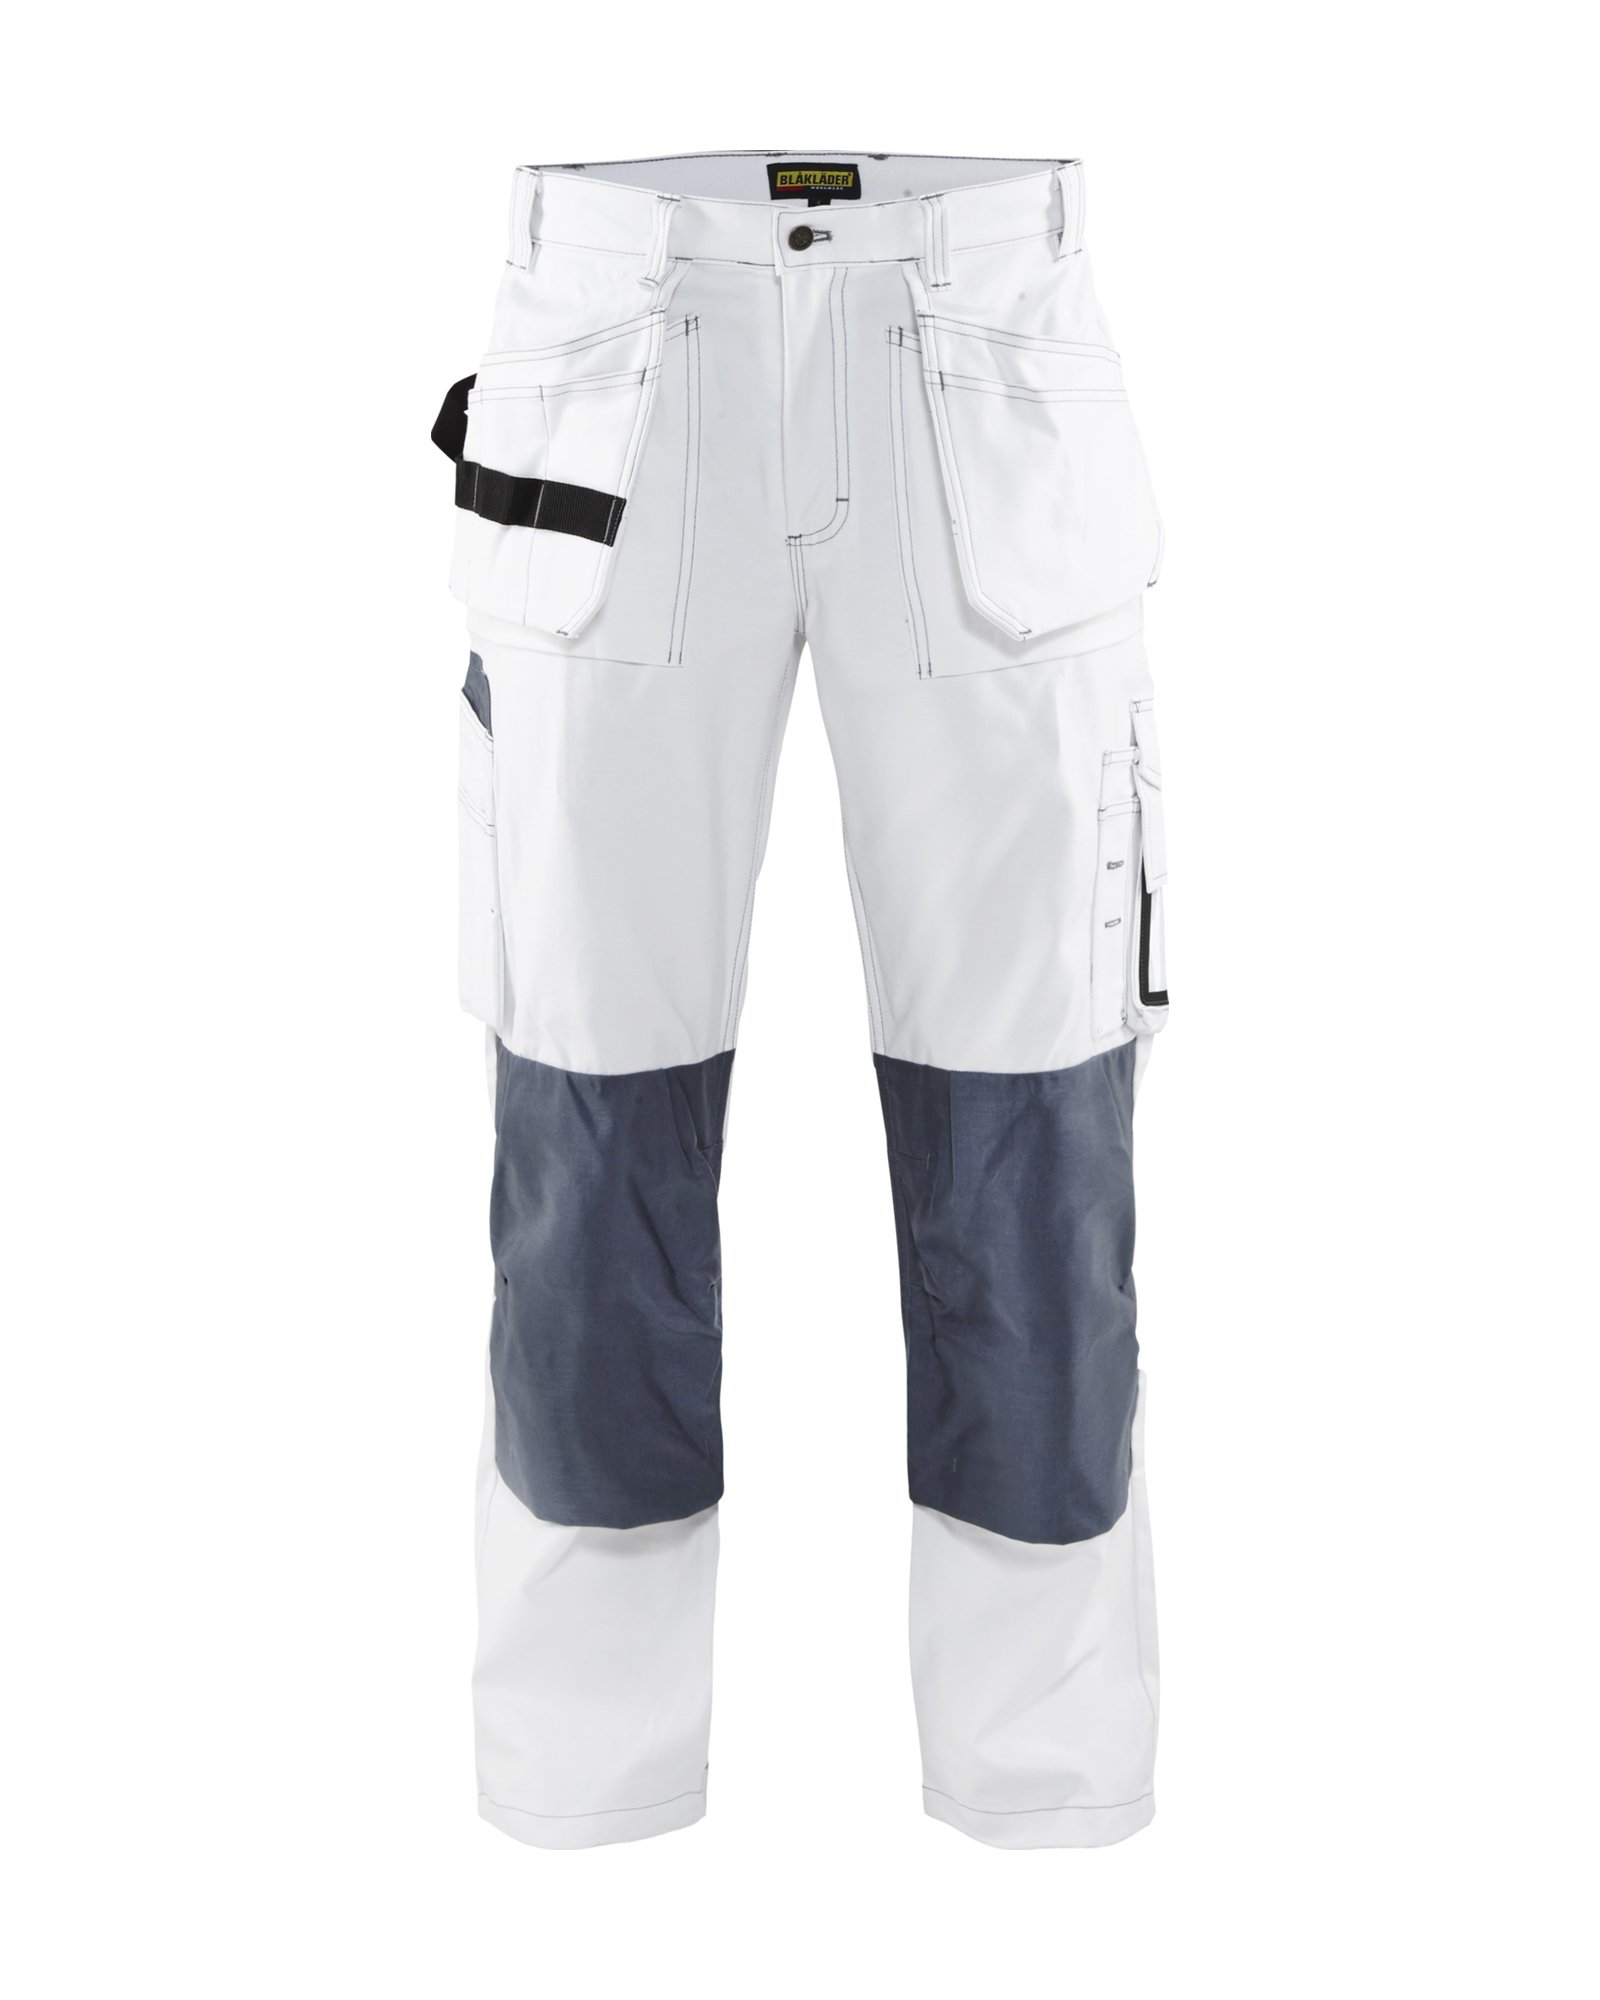 Blaklader Painter Pants White 32 32